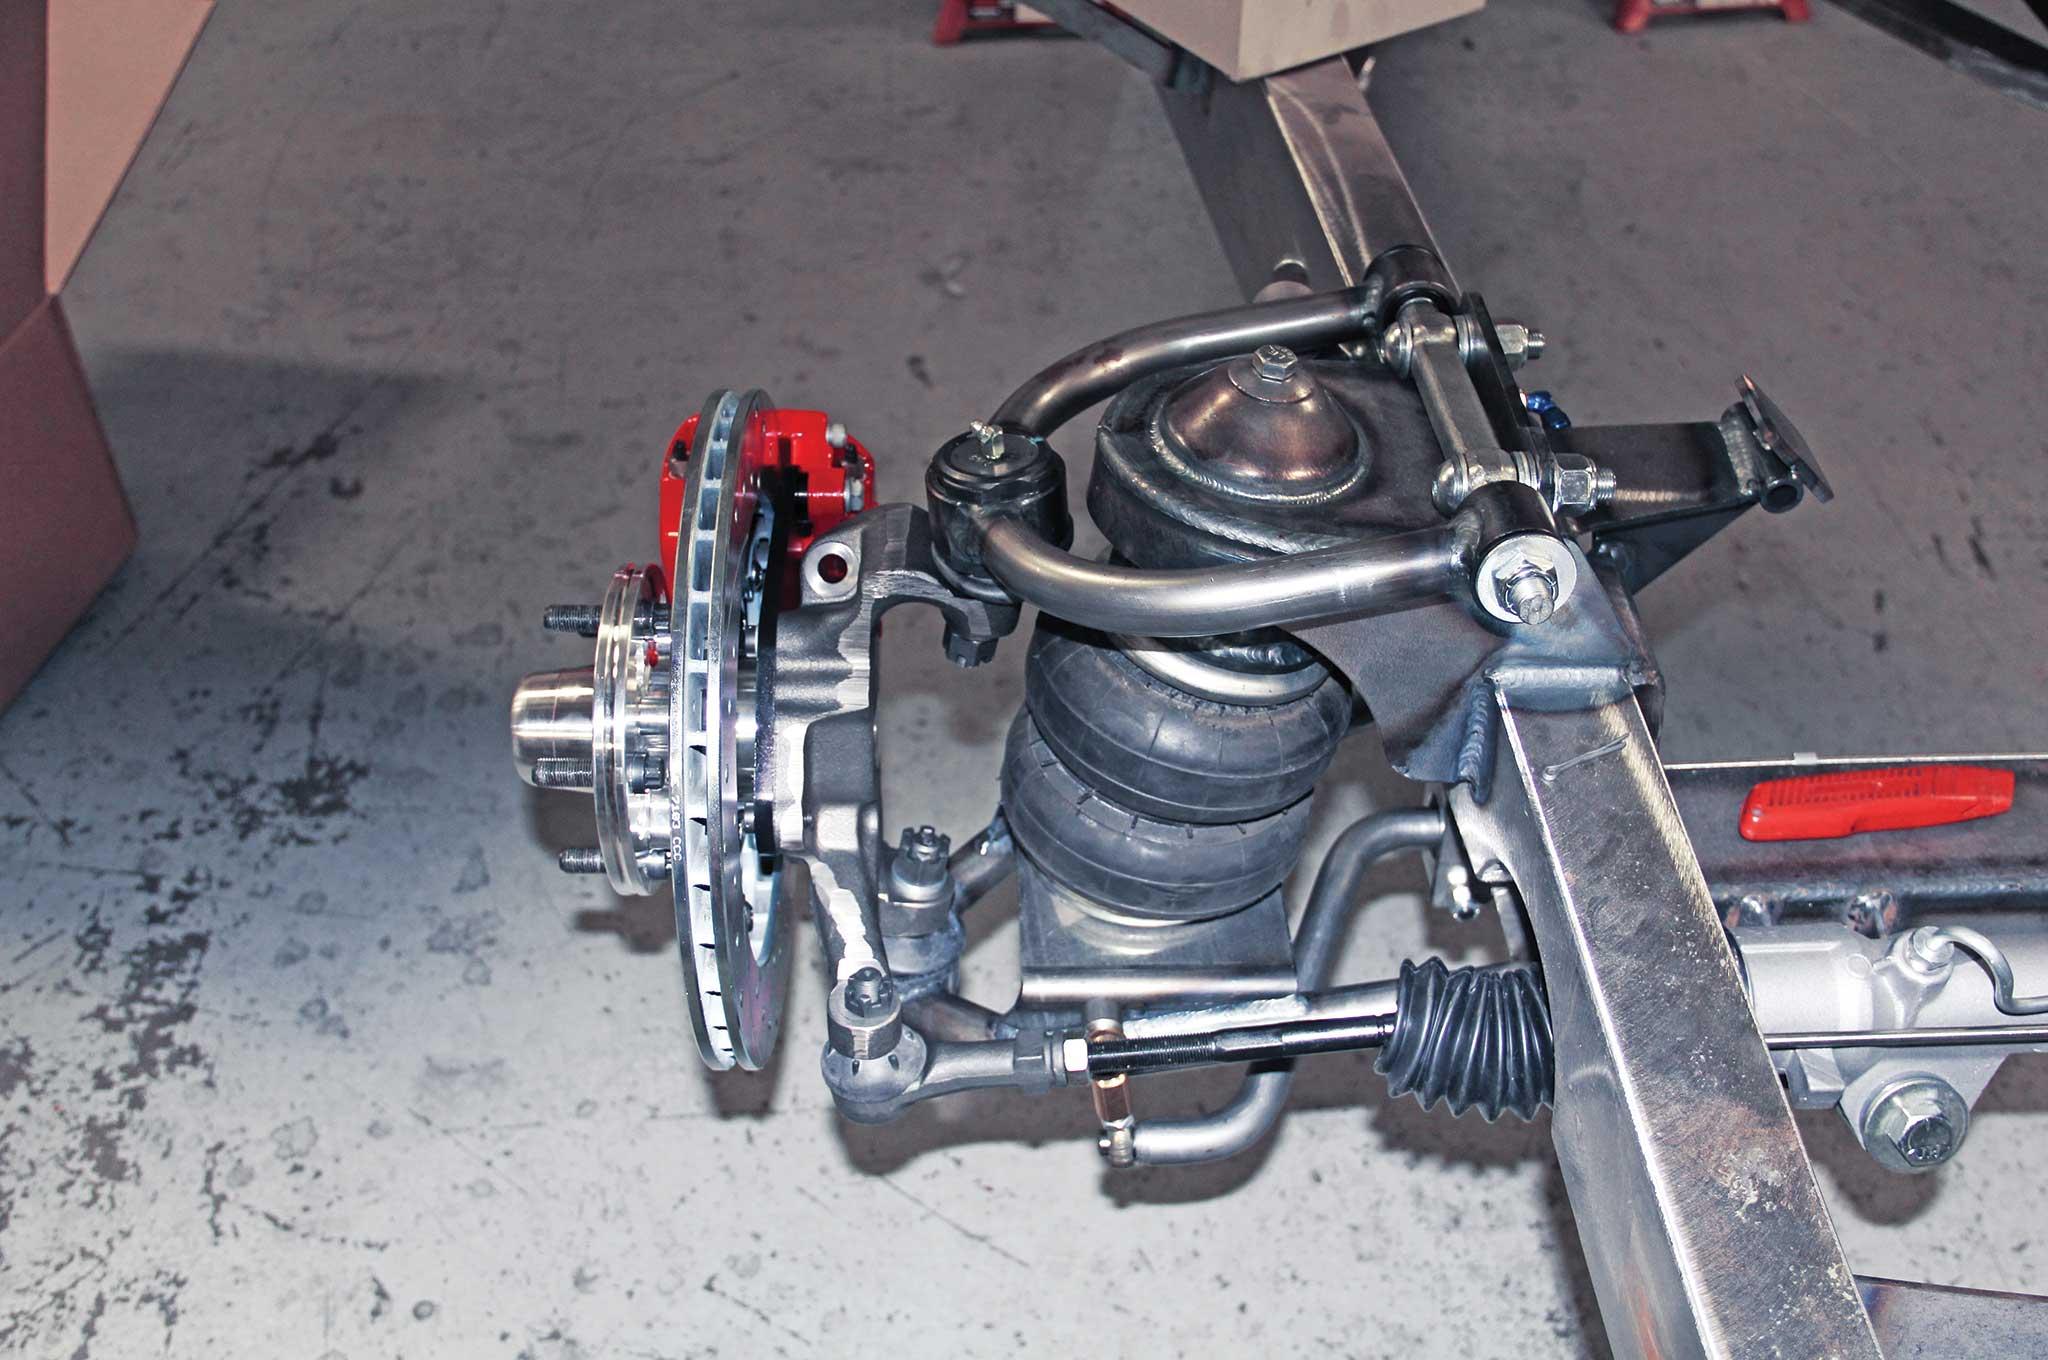 008 assembling a tci truck frame wilwood disc brake system